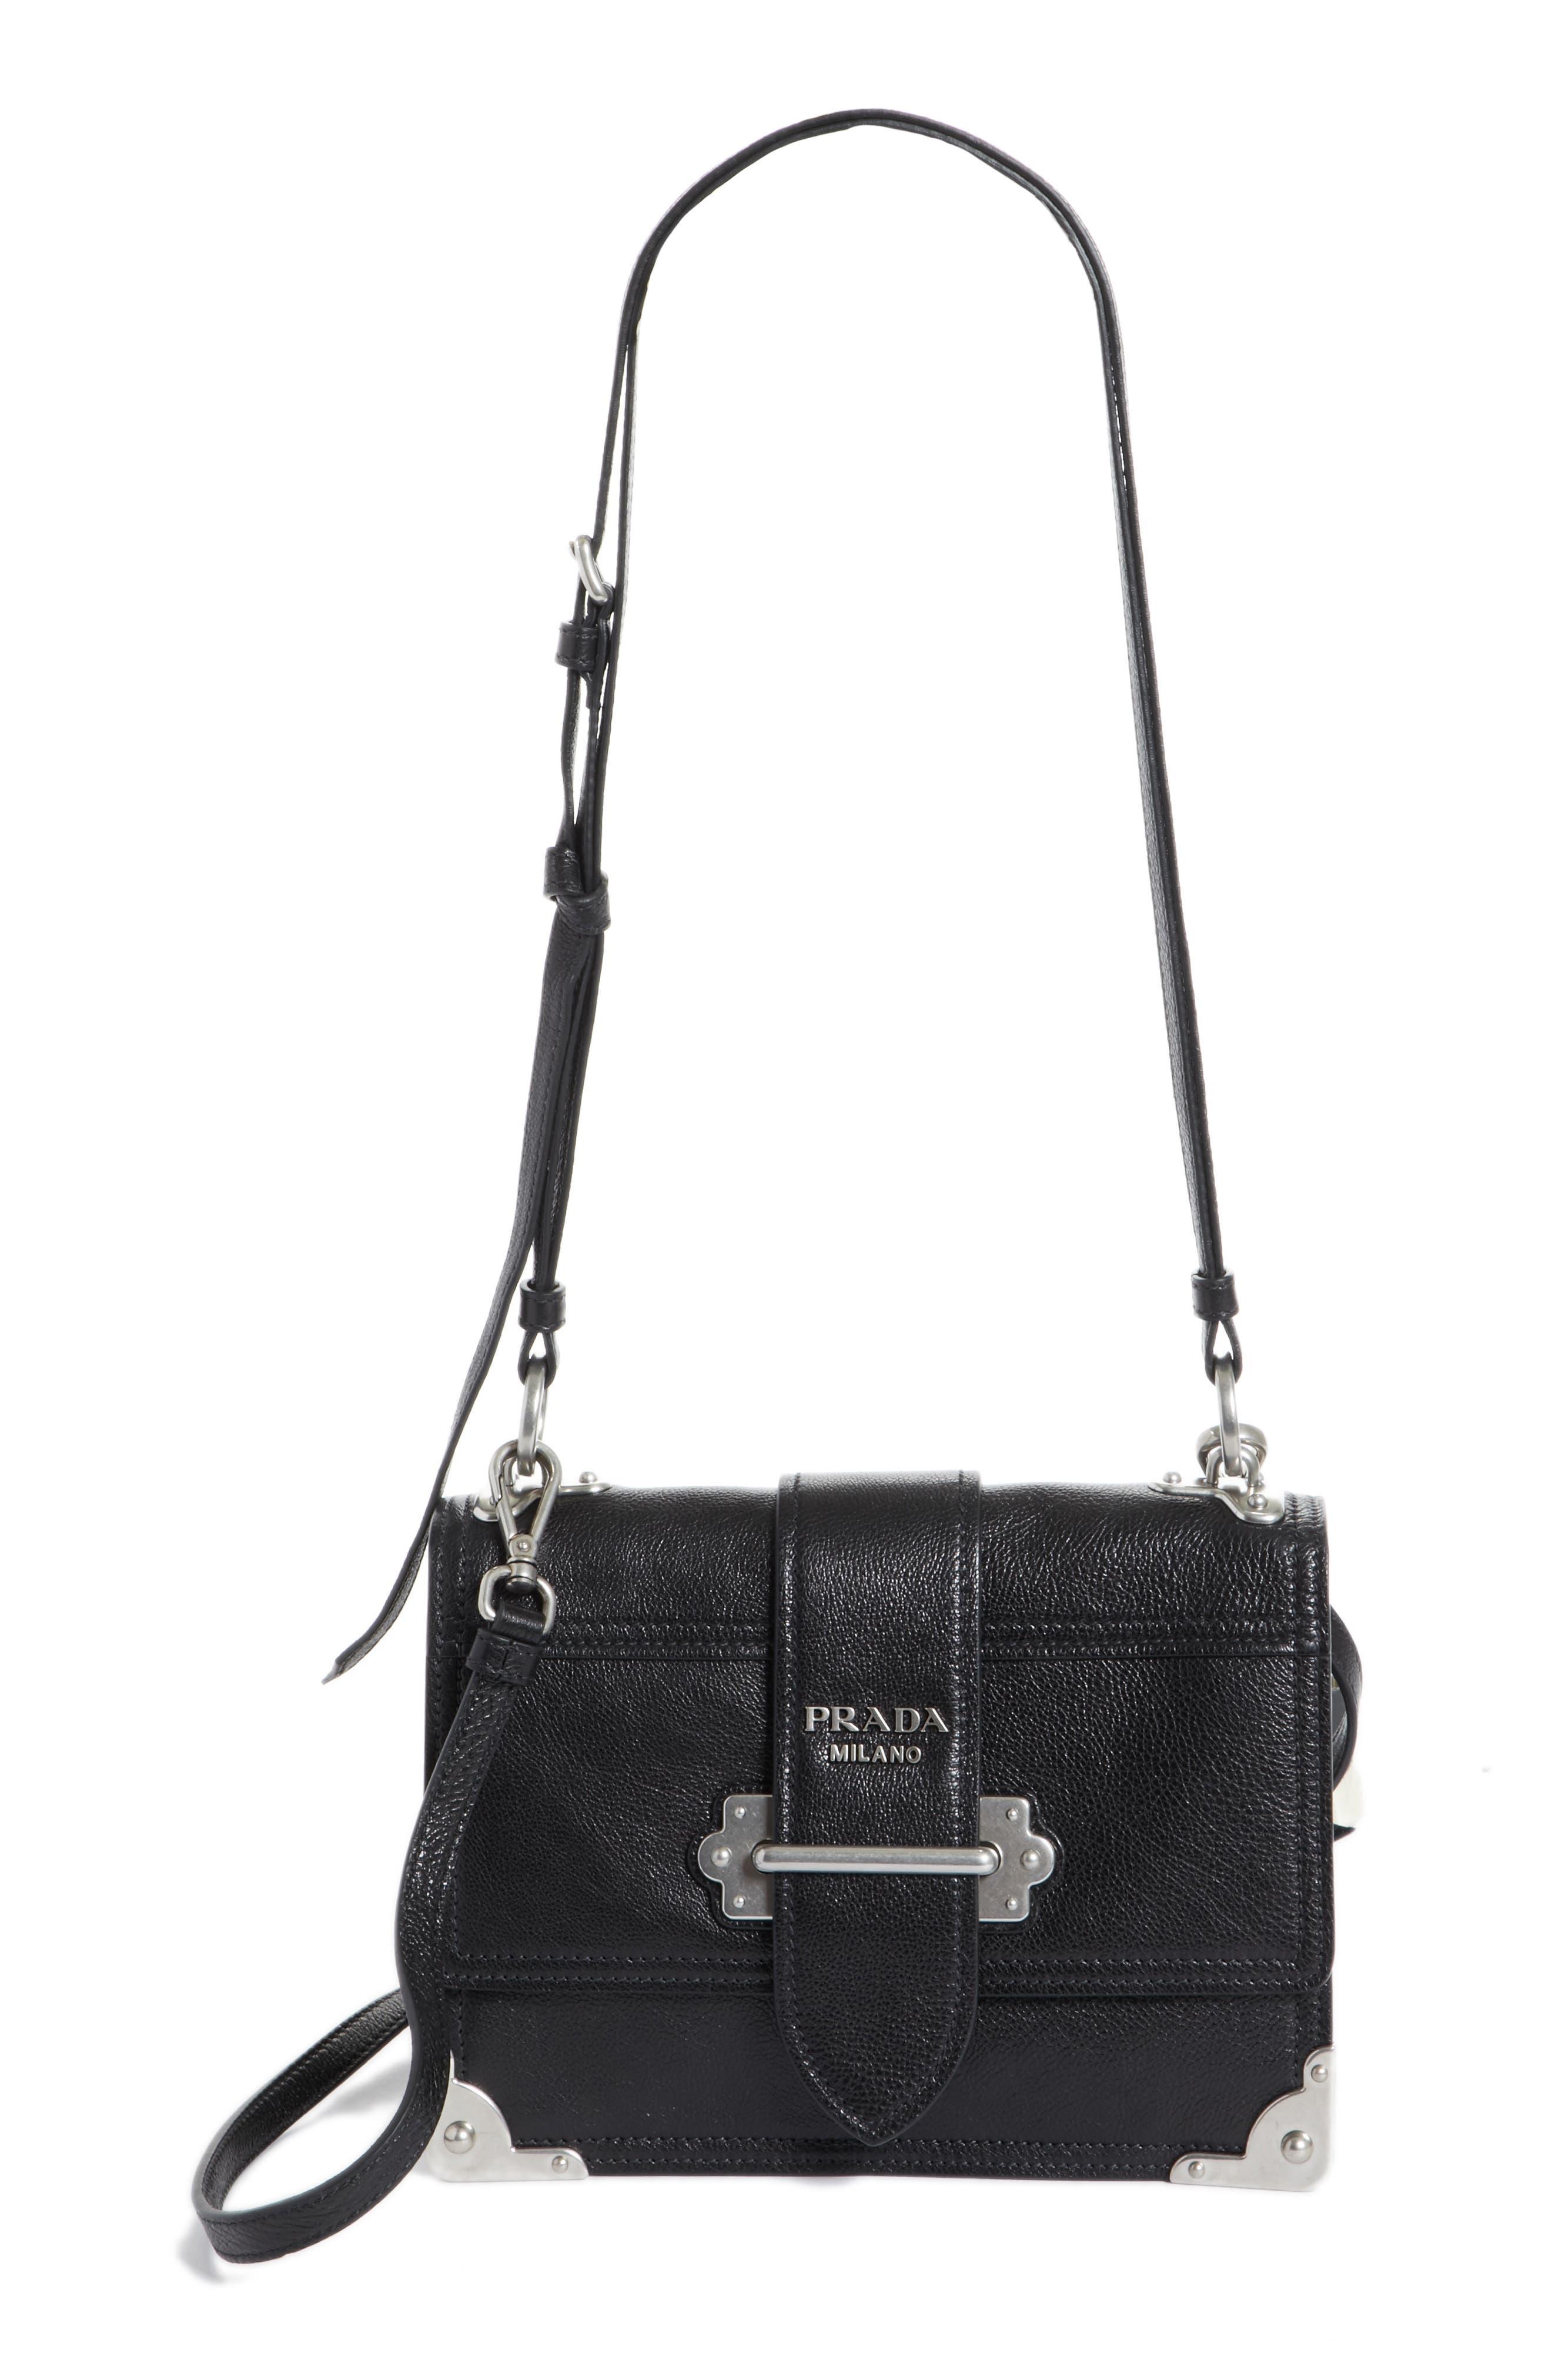 Alternate Image 1 Selected - Prada Cahier Glace Calfskin Convertible Shoulder Bag